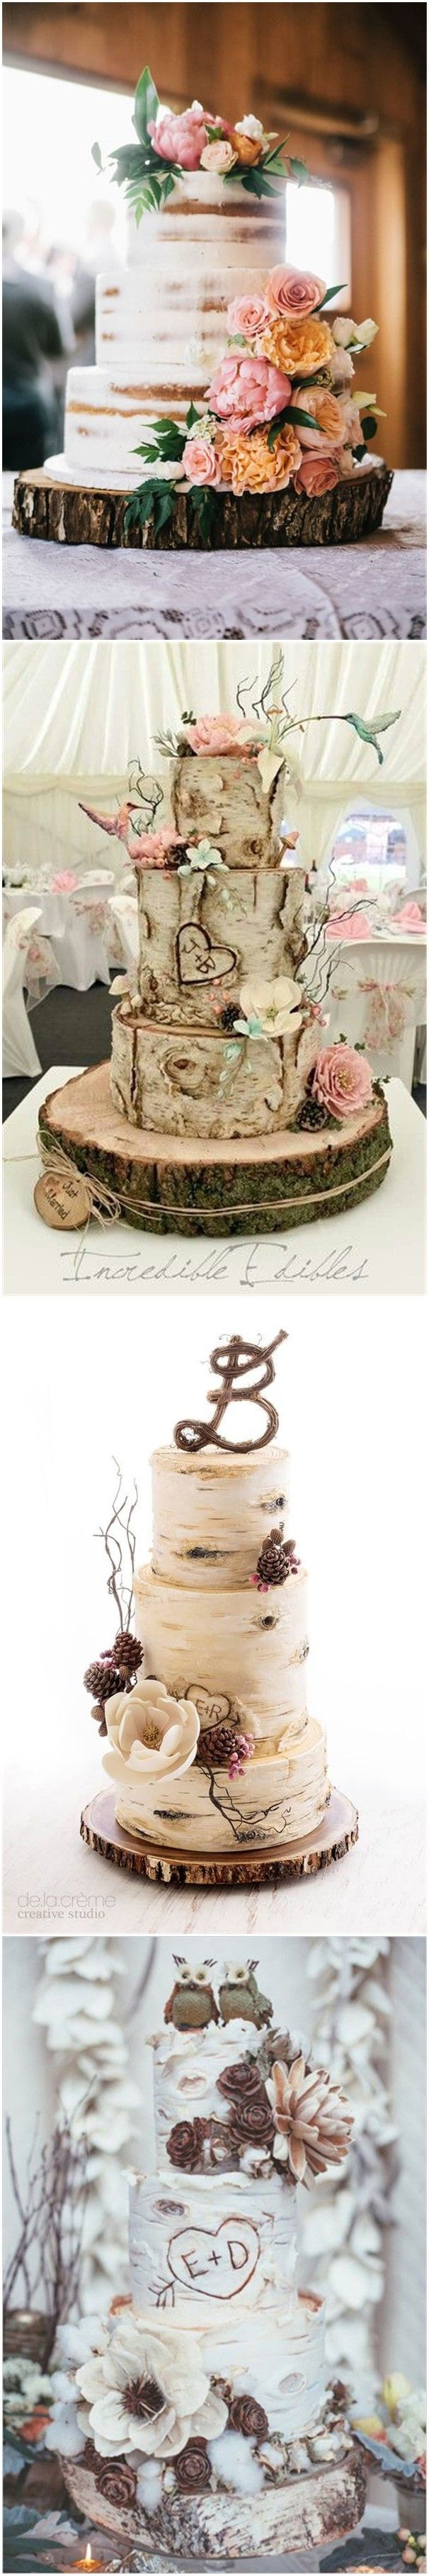 599 best Wedding Cakes images on Pinterest